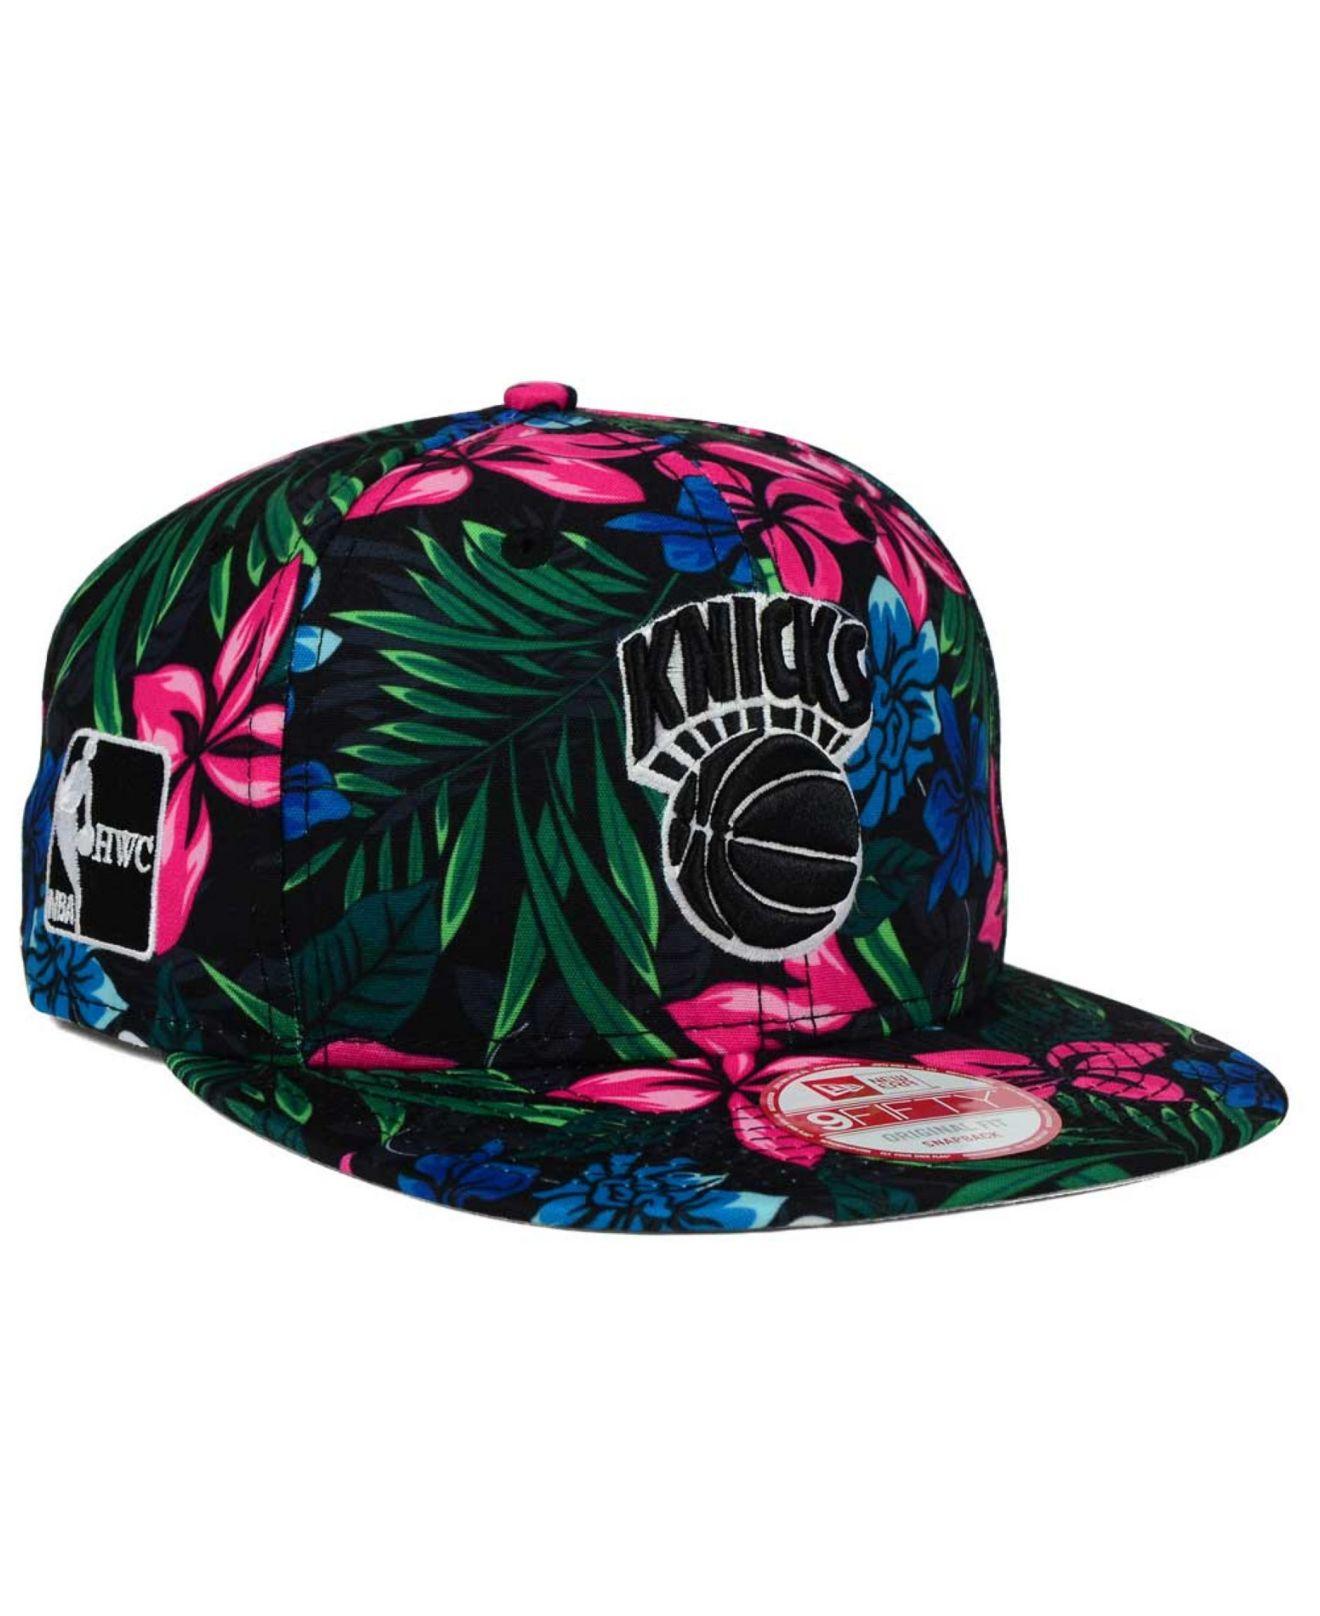 Lyst - KTZ New York Knicks Shadow Floral 9fifty Snapback Cap in ... 57b005c49e8